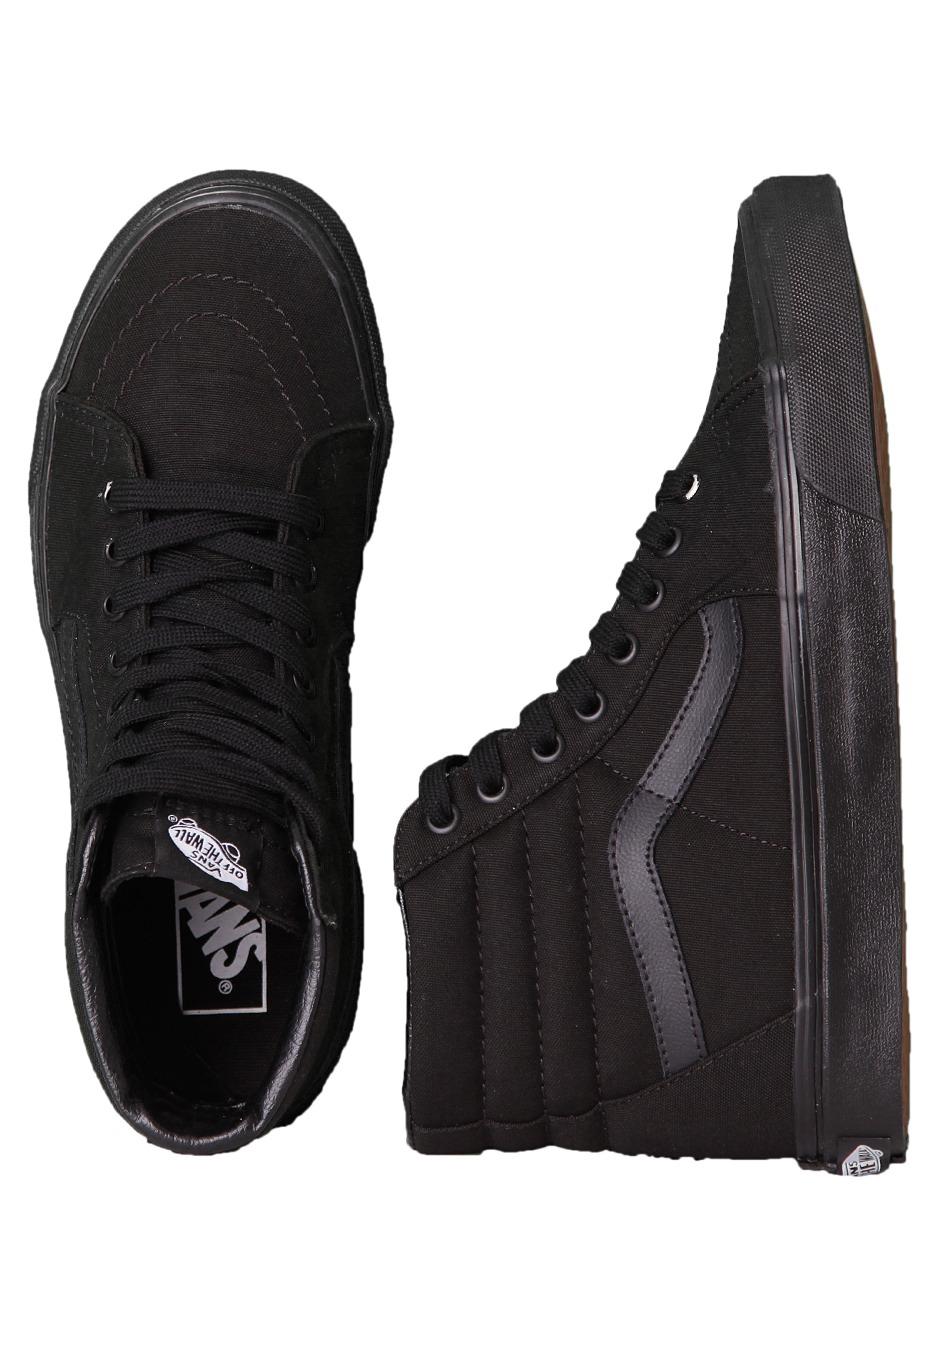 vans high top all black